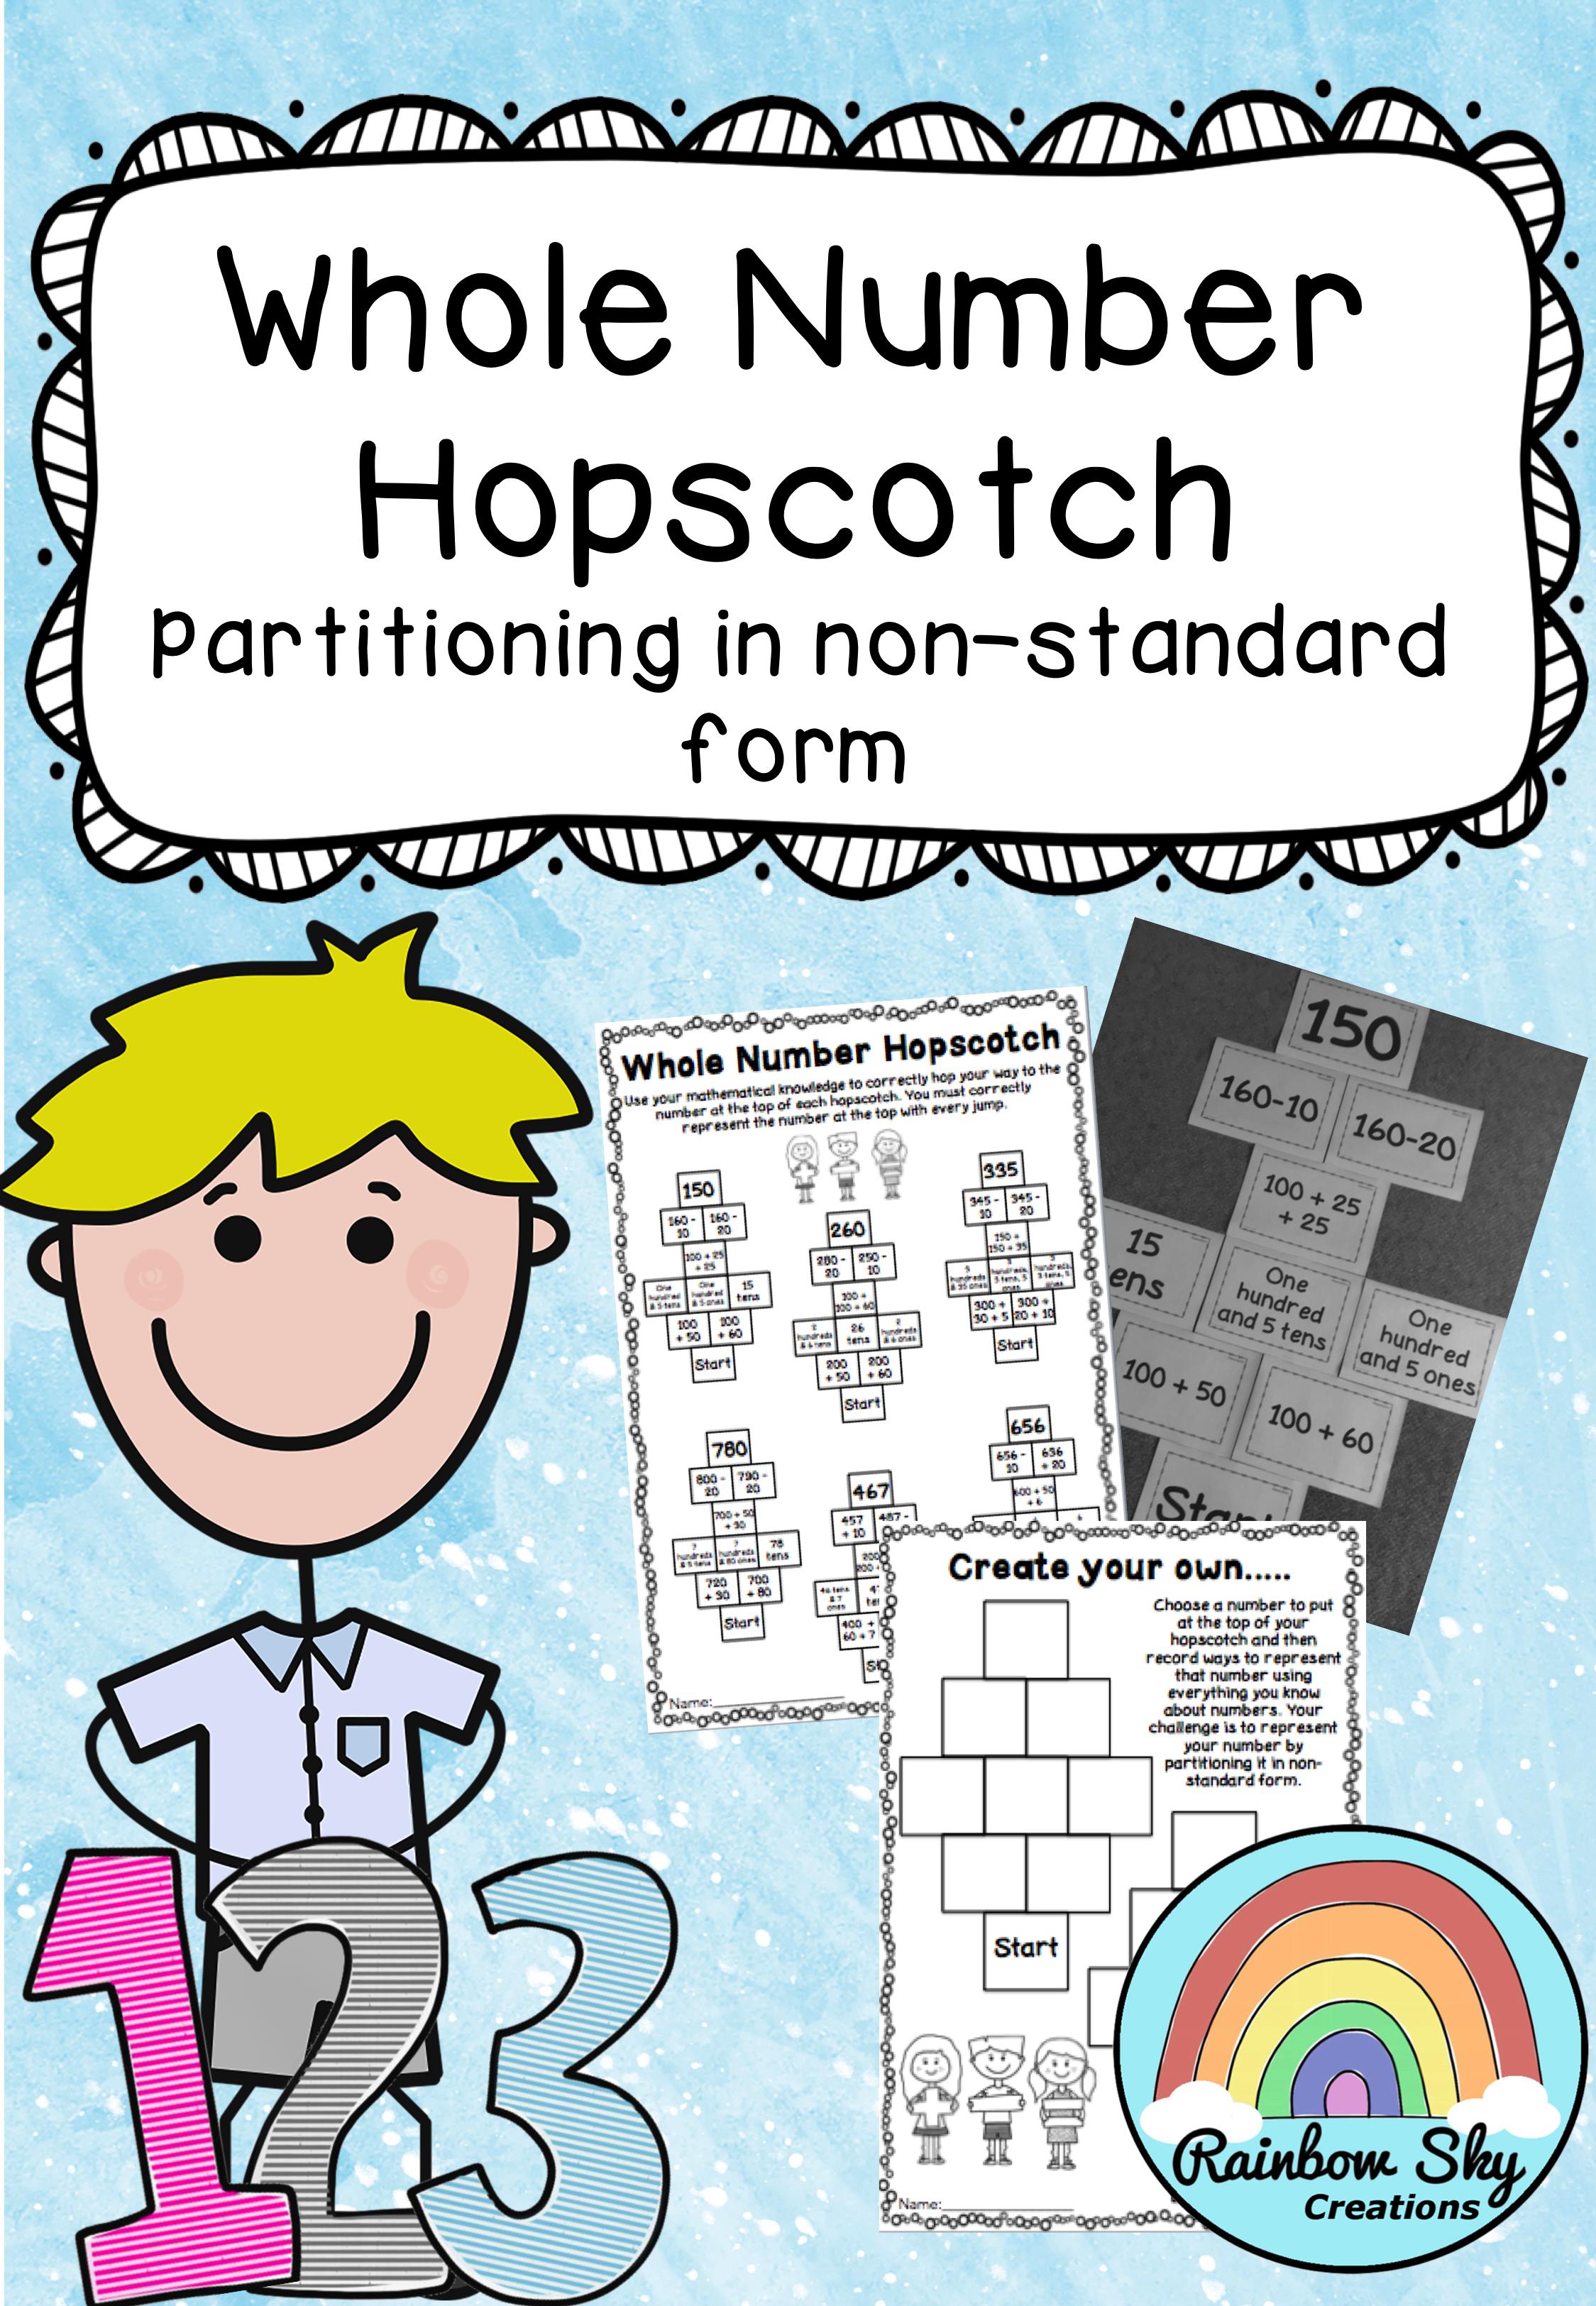 Whole Number Hopscotch